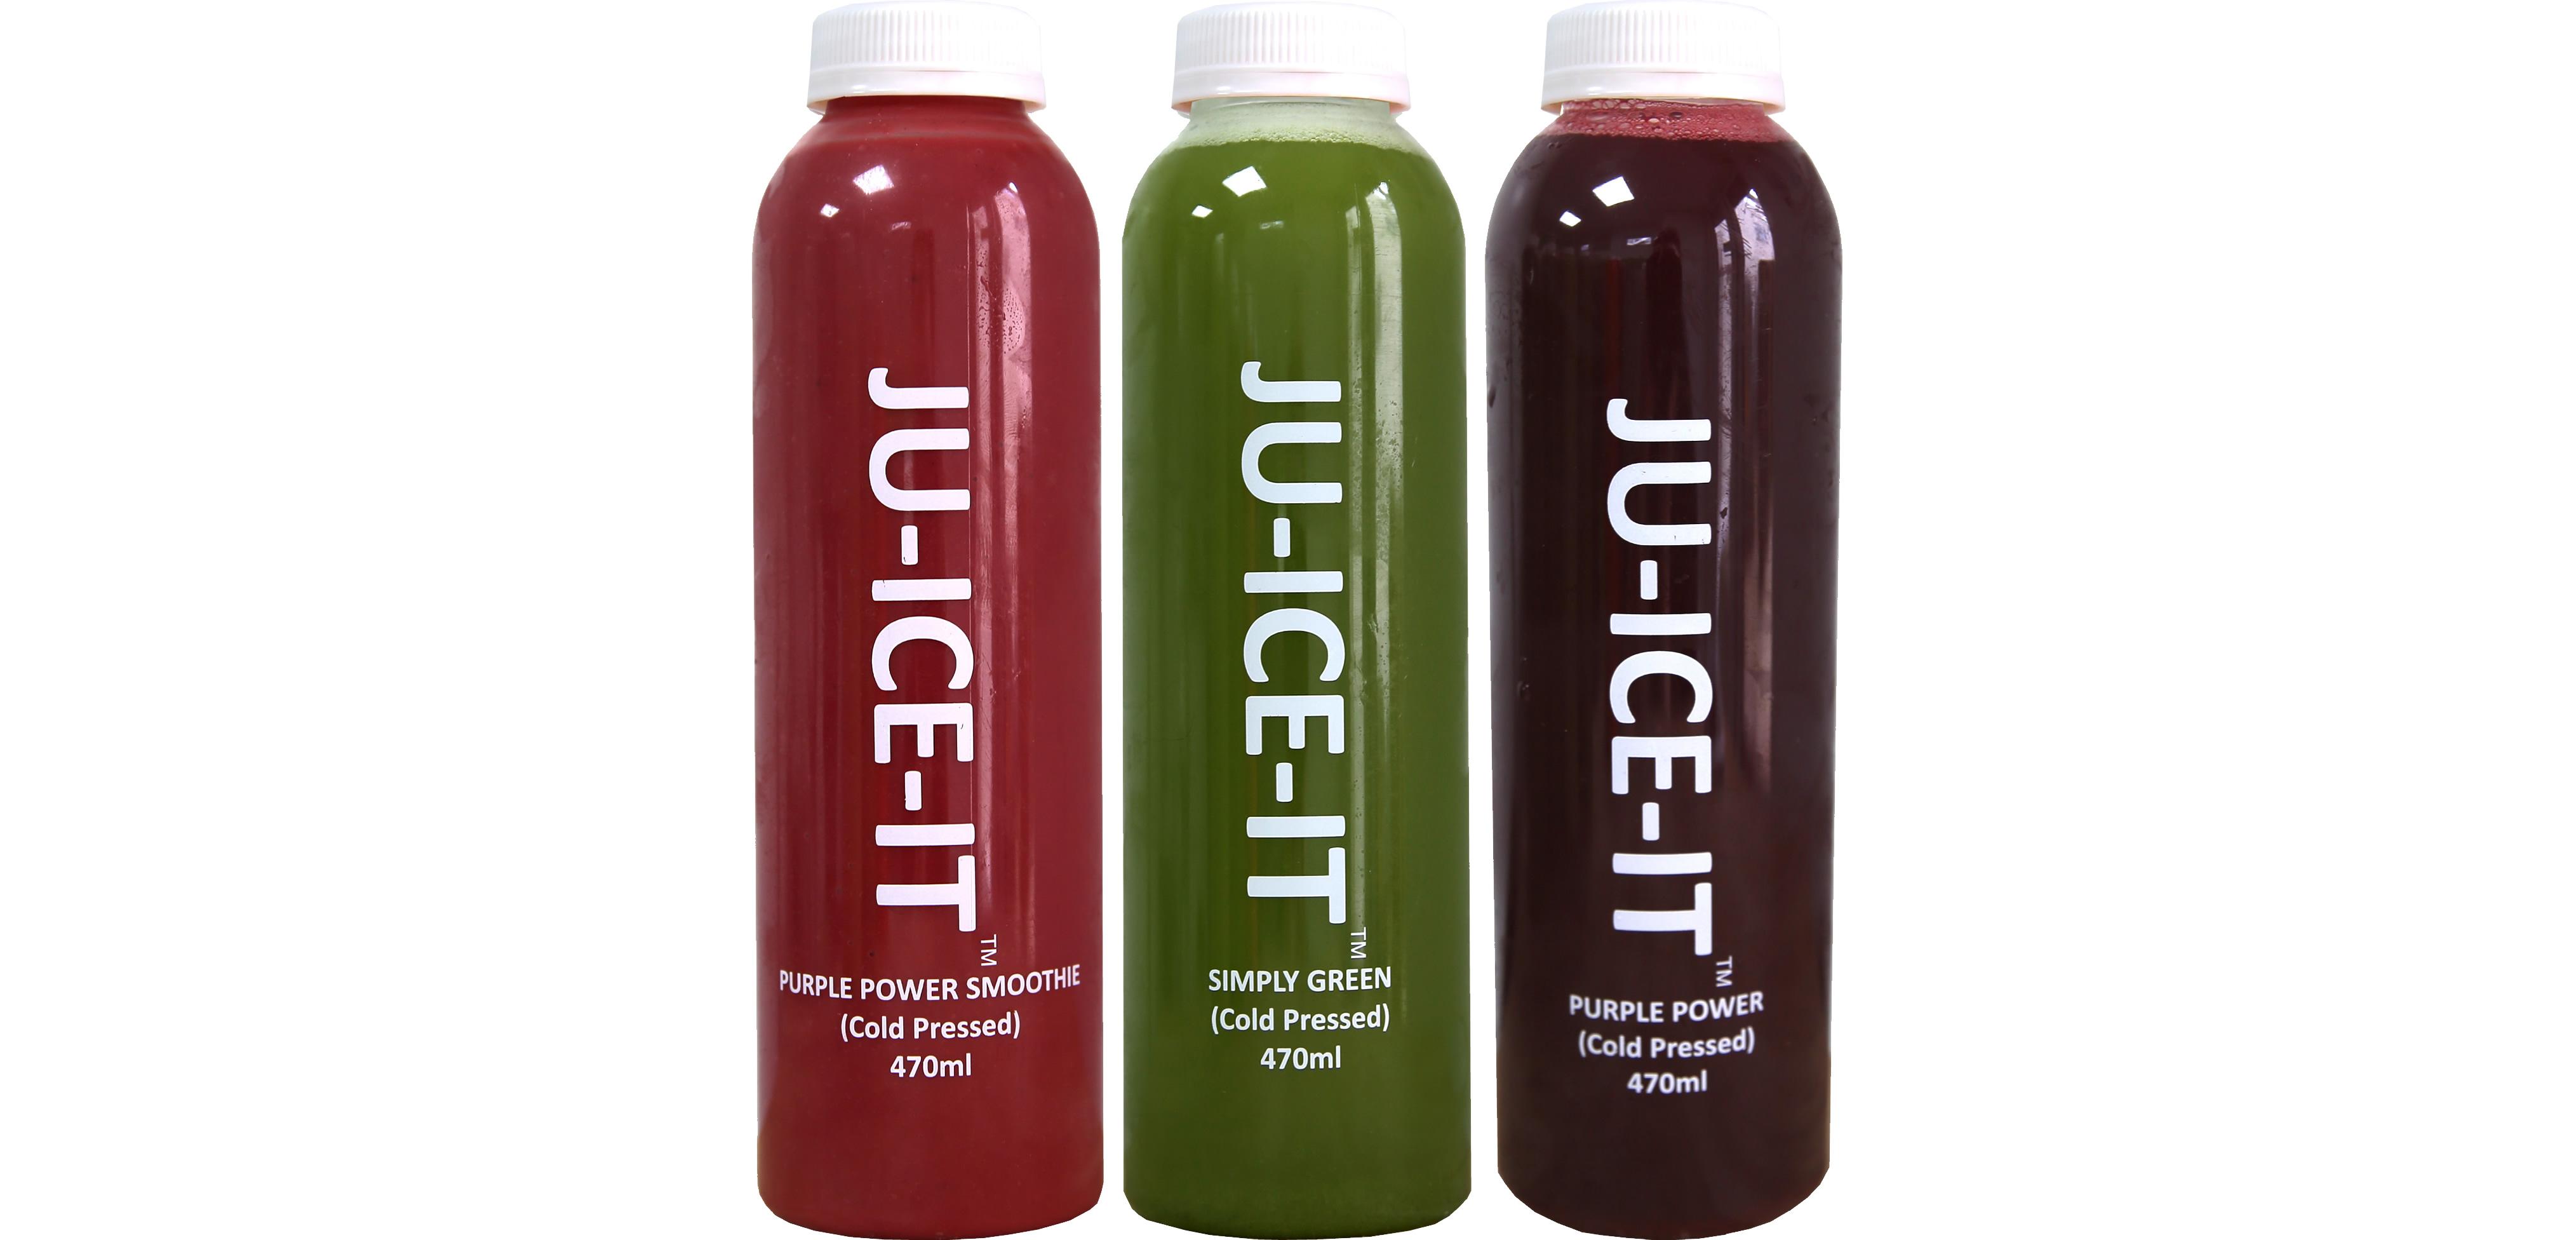 3 juices